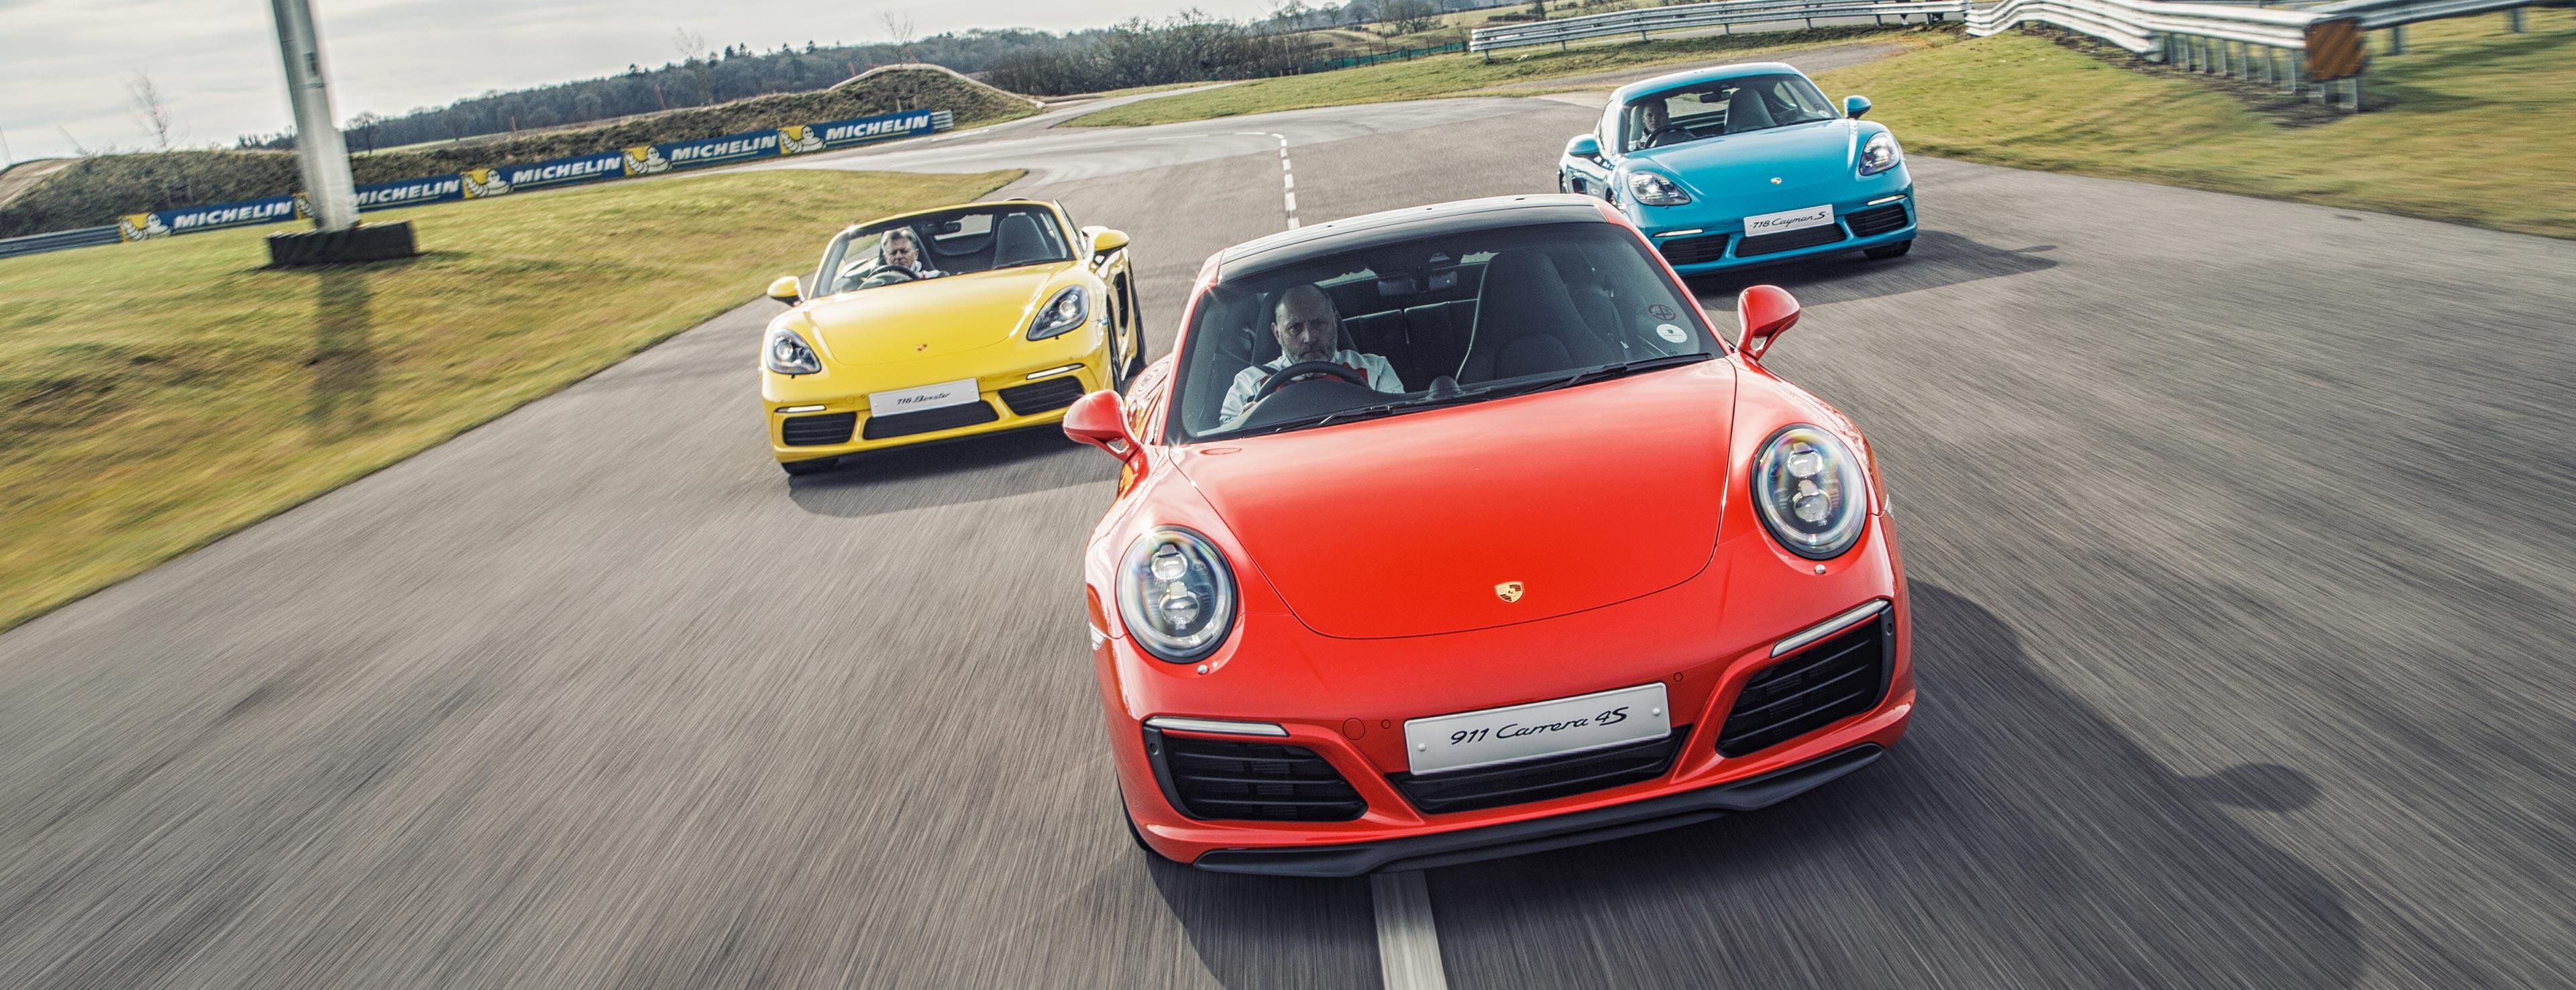 Porsche About Us Home Porsche Cars Great Britain Ltd